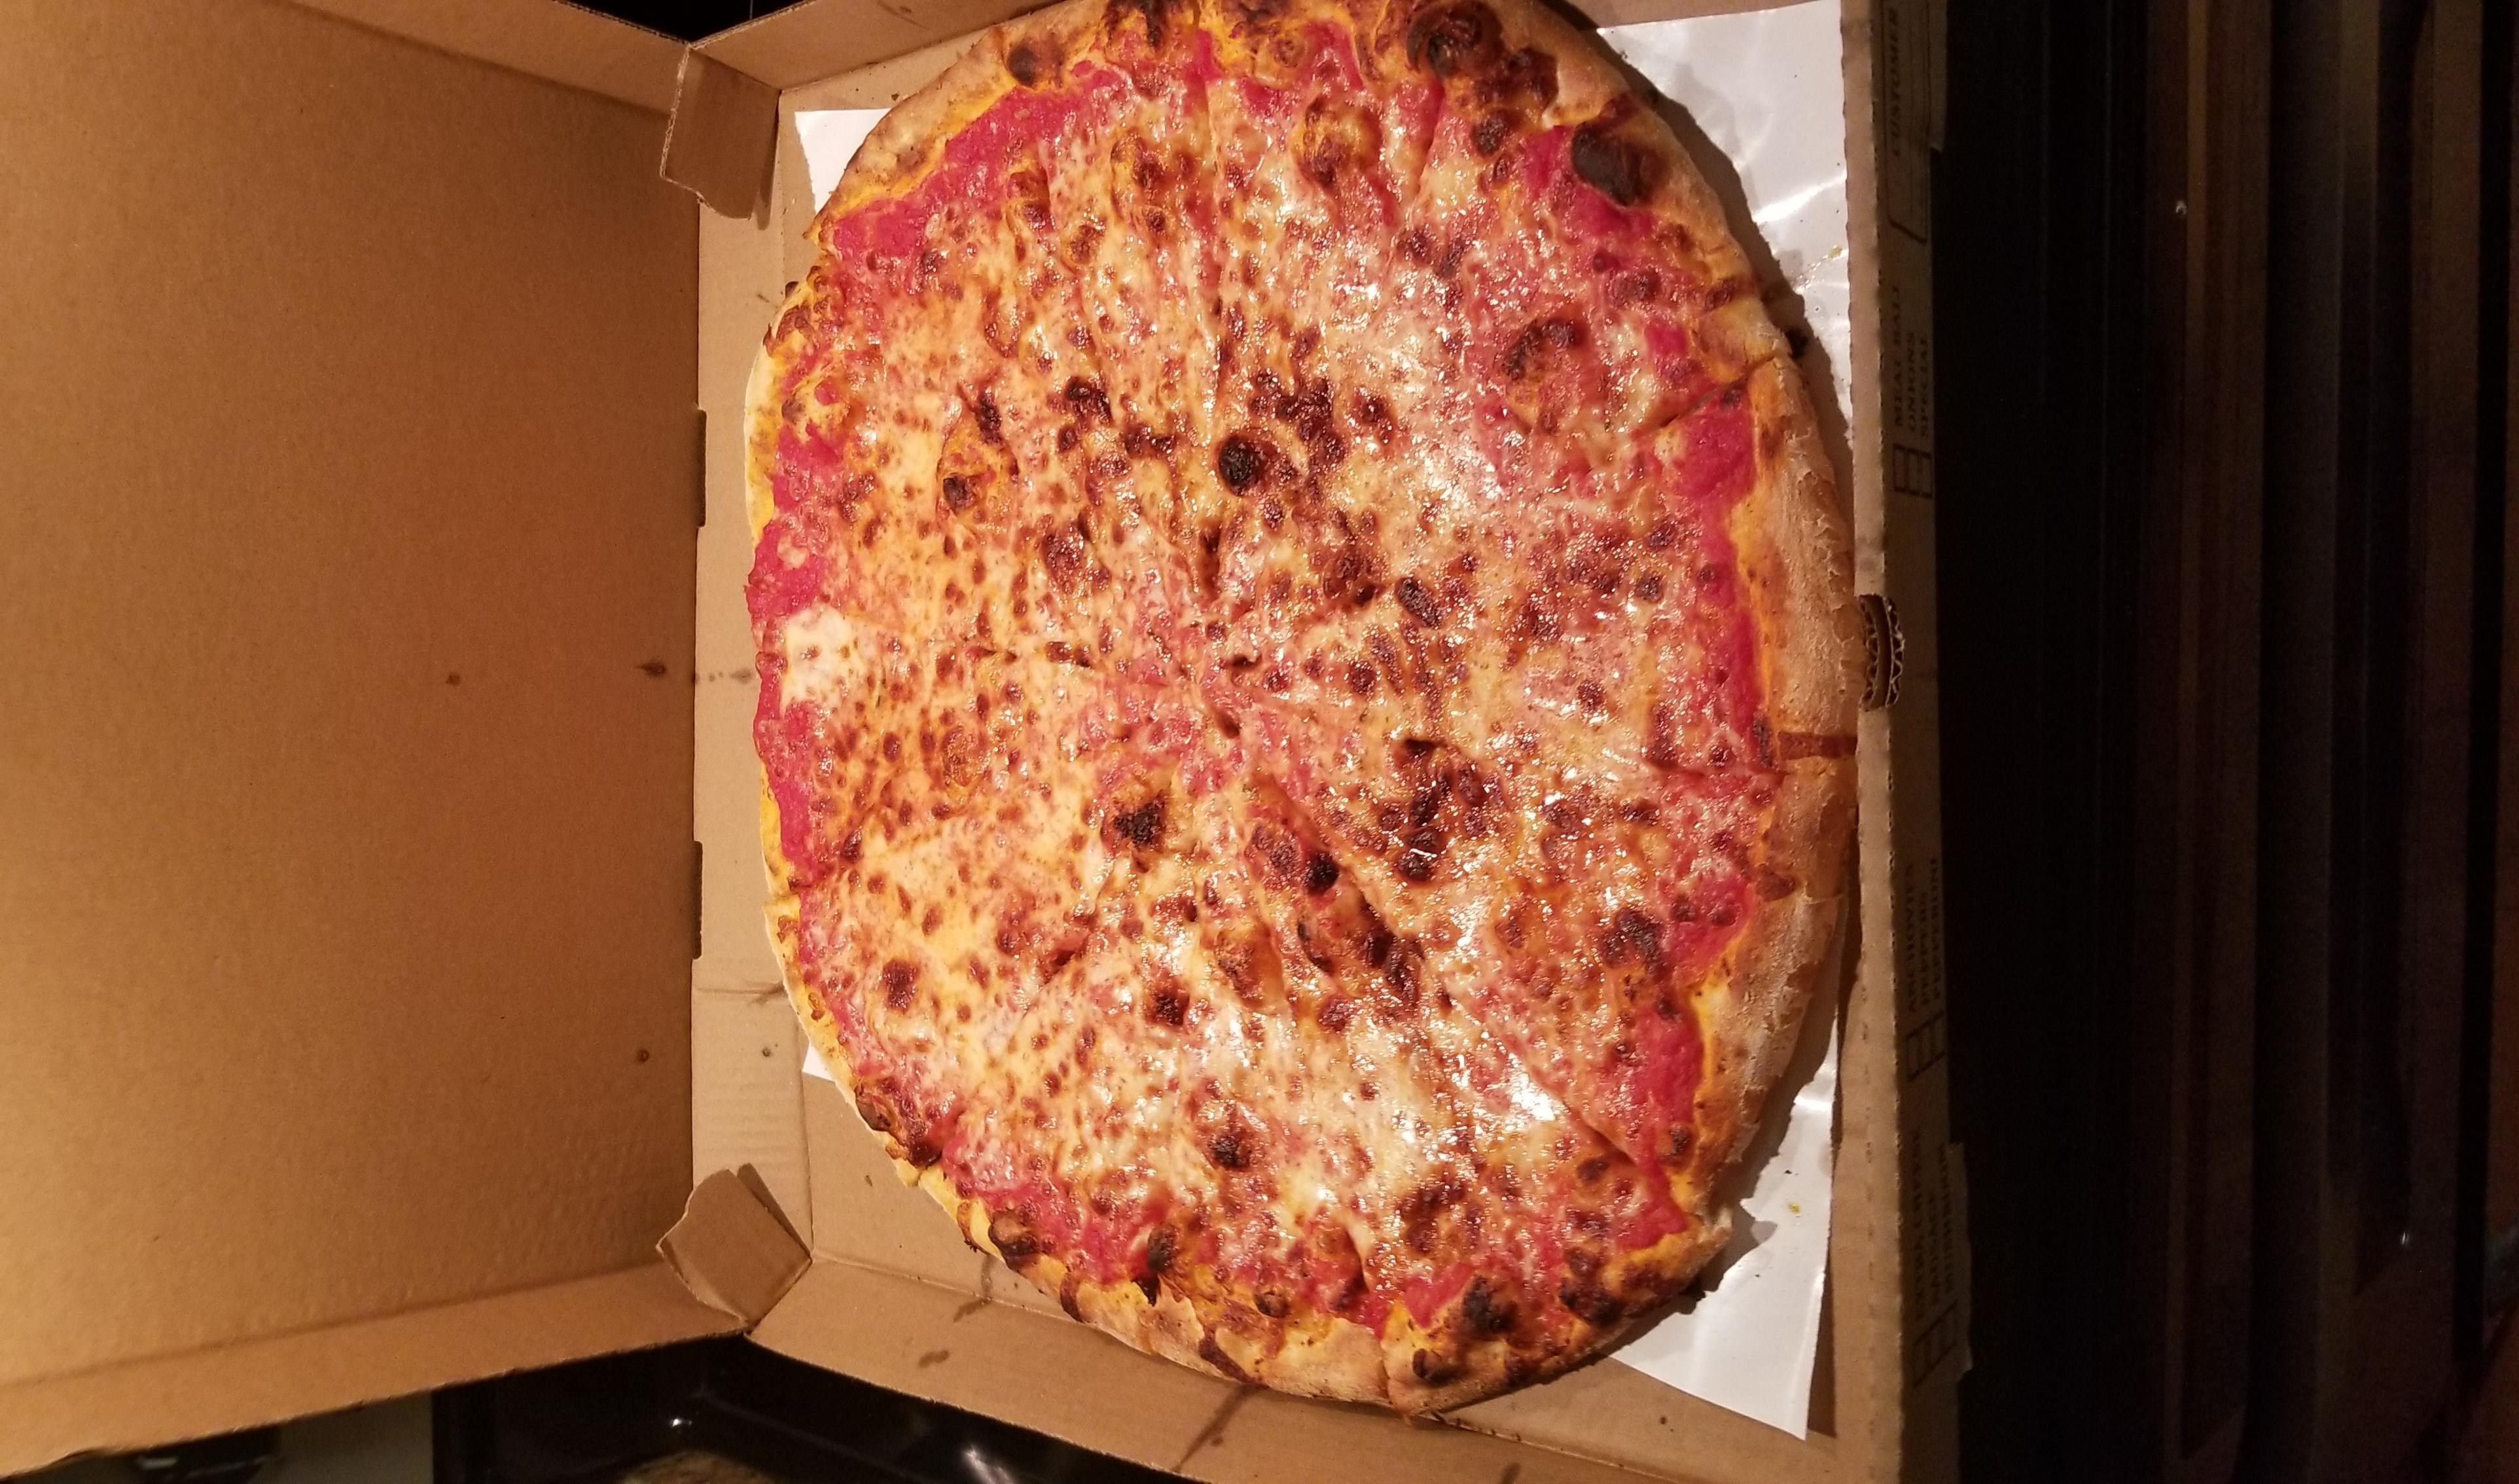 randy.molster on One Bite Pizza App